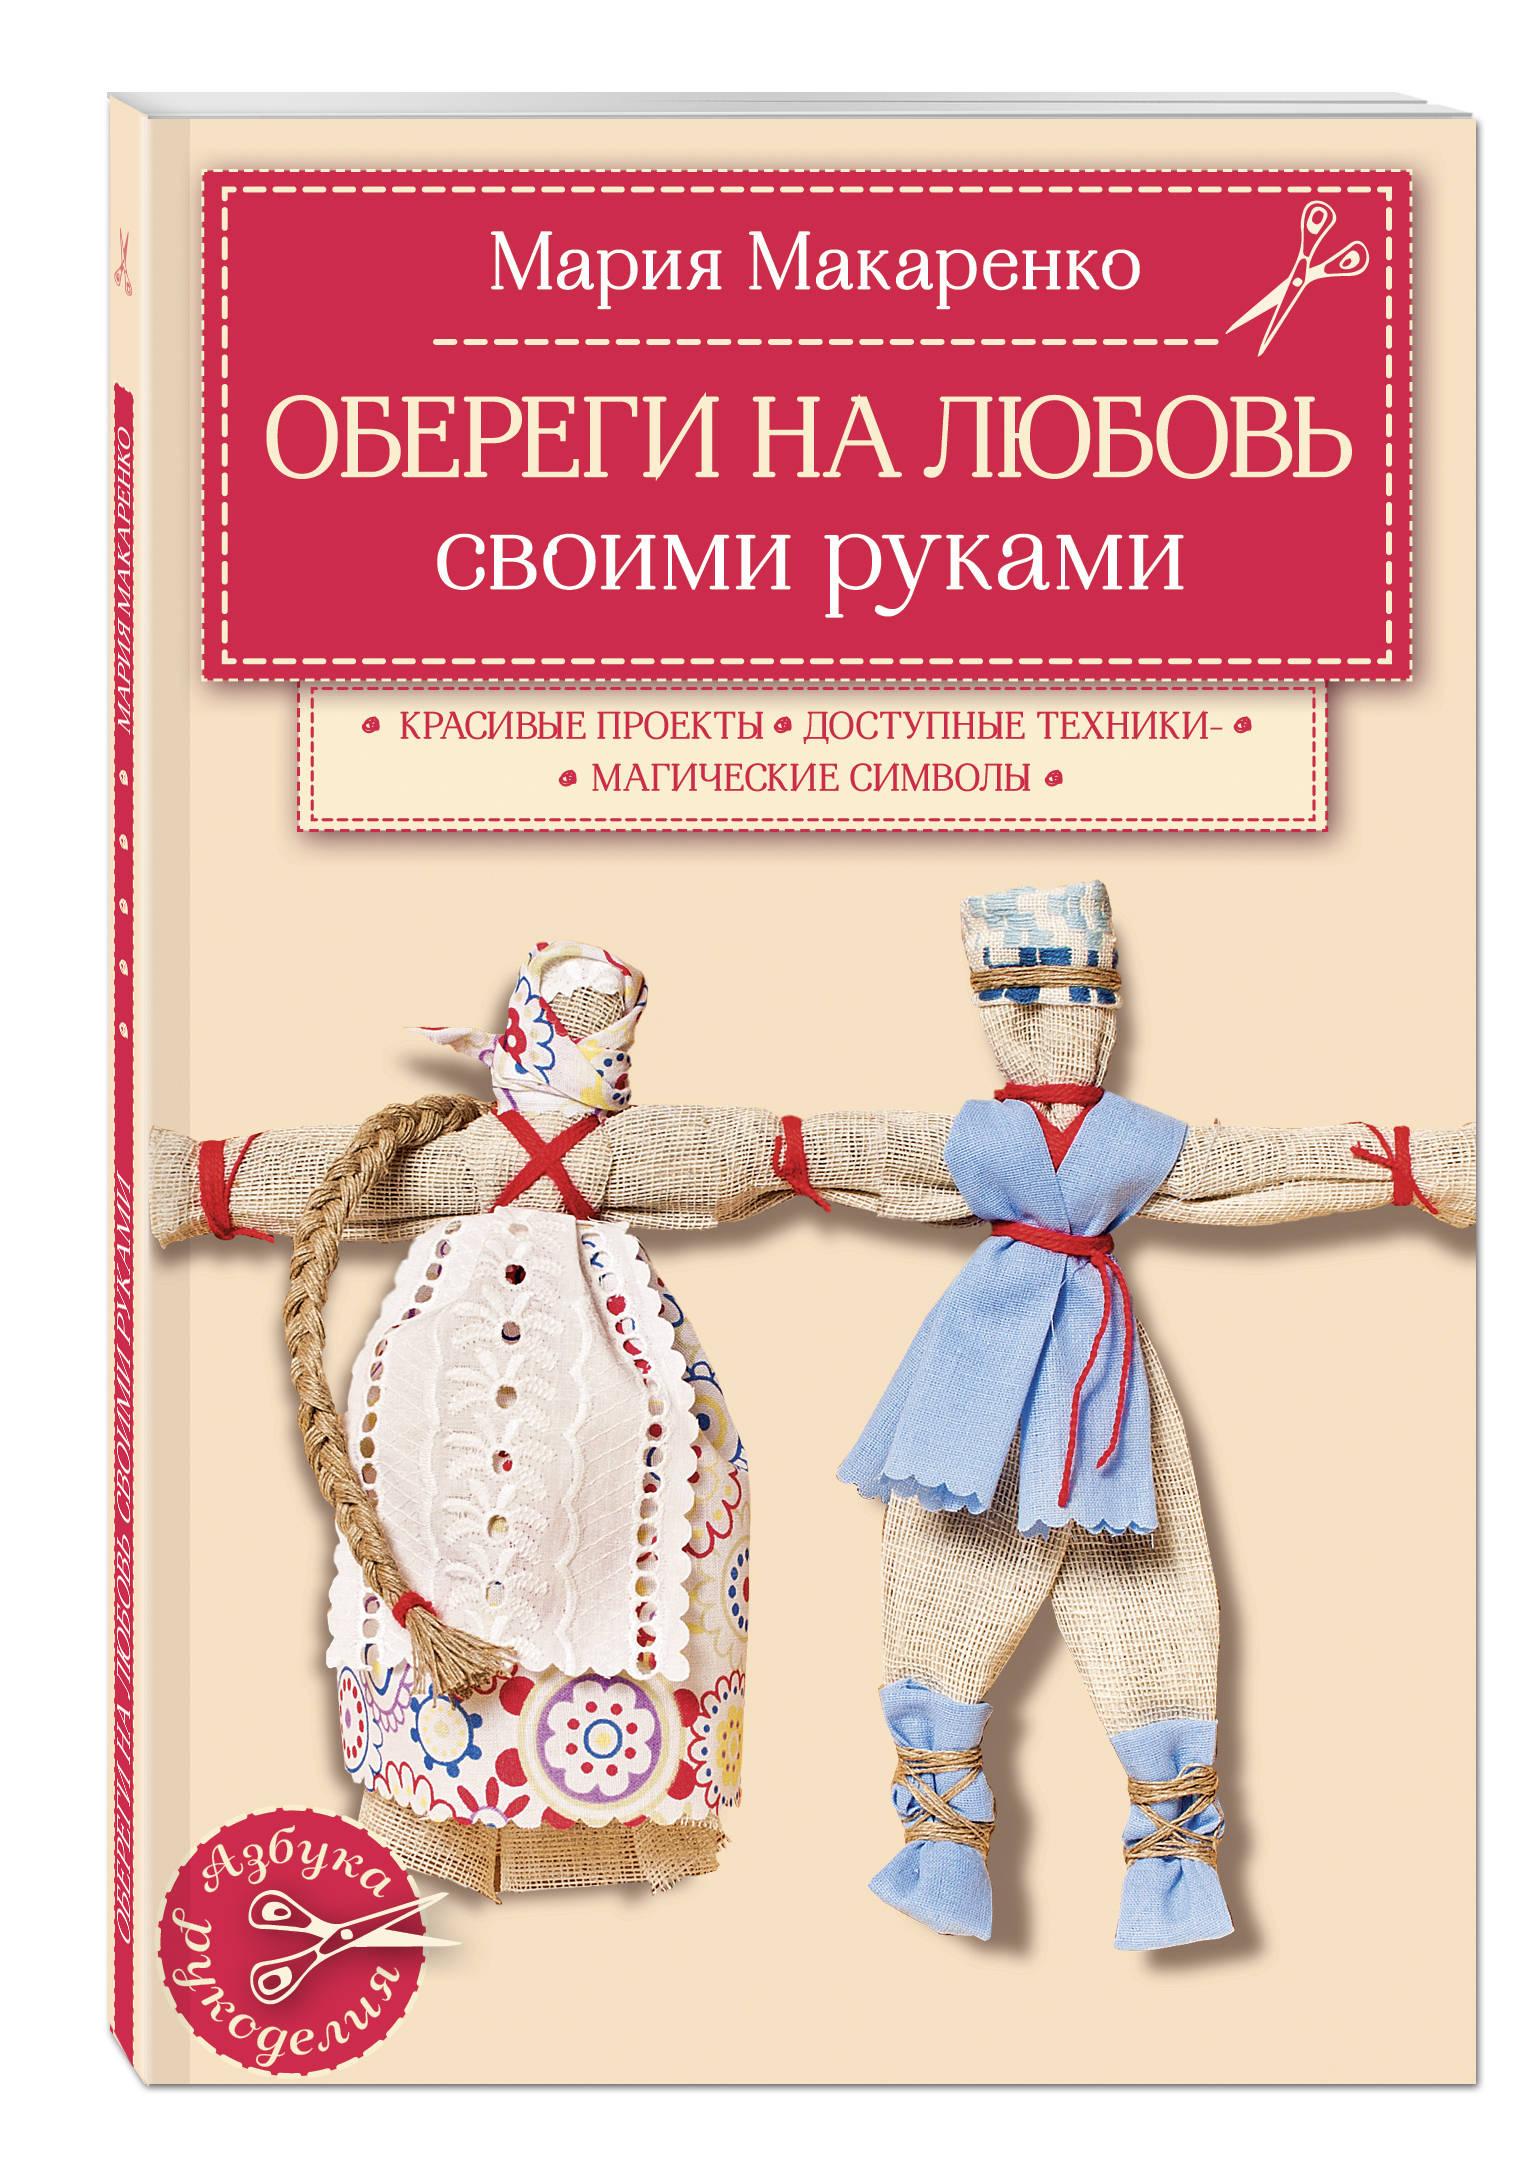 Макаренко М.К. Обереги на любовь ISBN: 978-5-699-80919-6 обереги на любовь